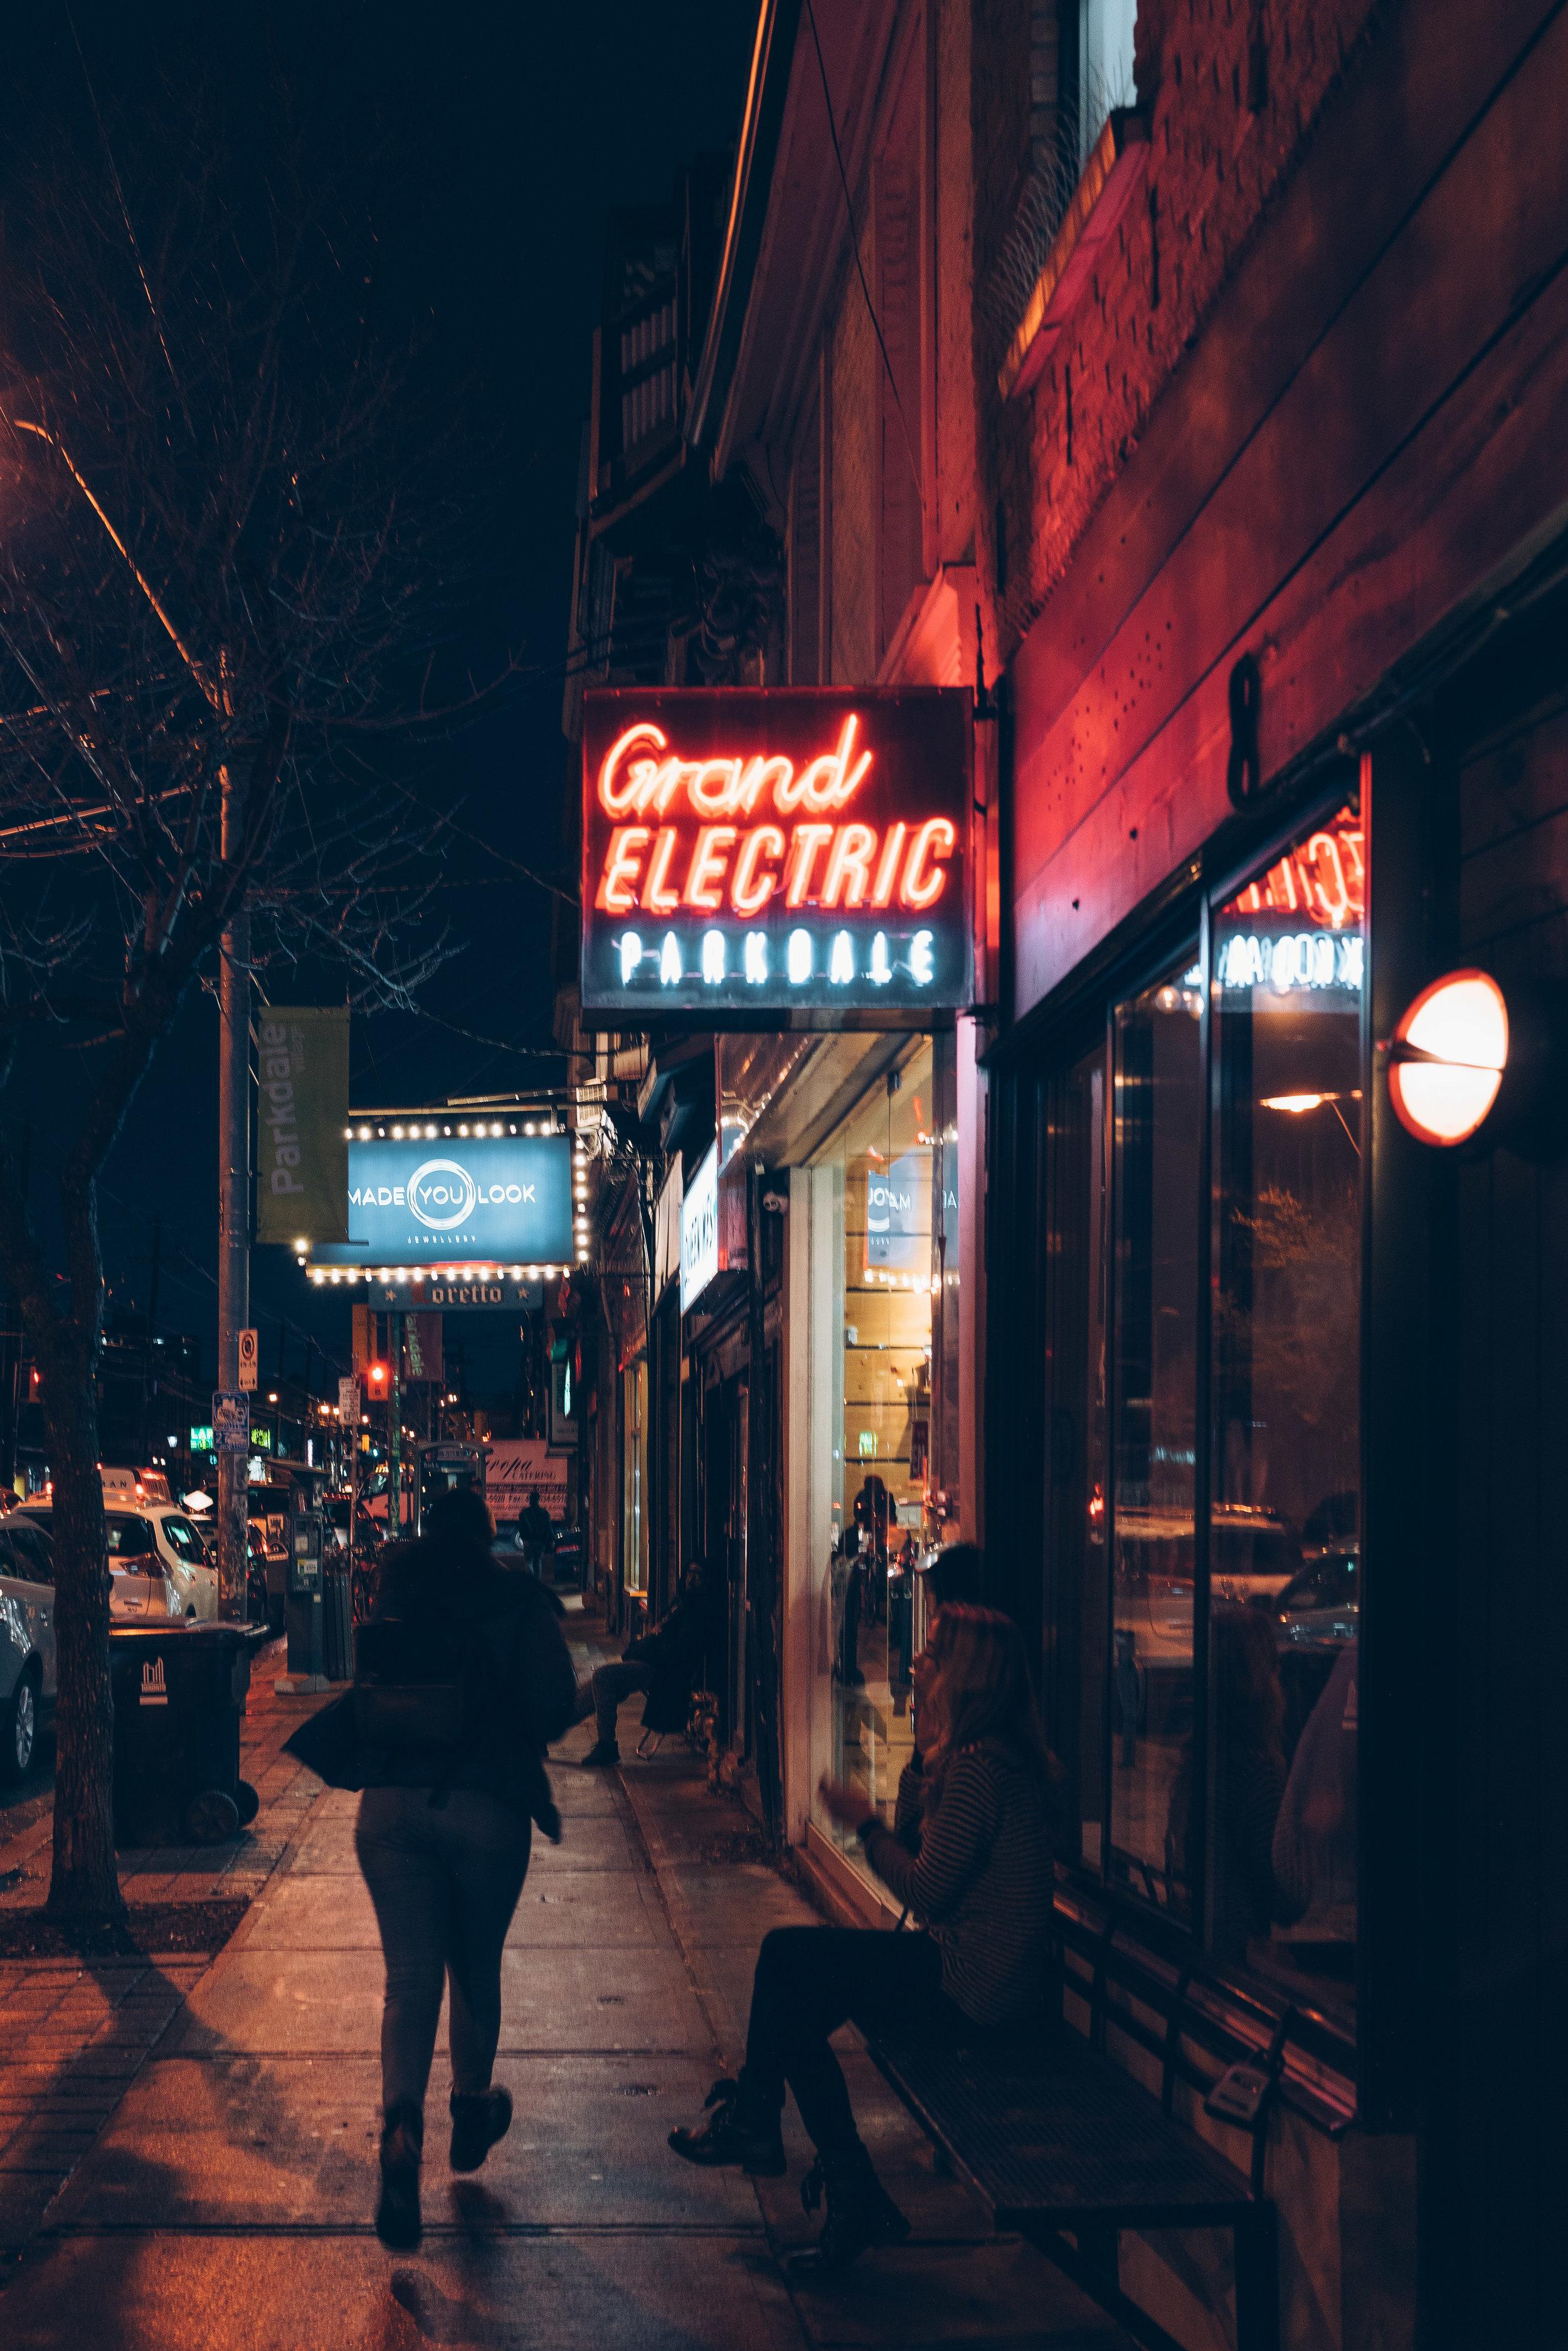 Grand Electric Tacos.jpg